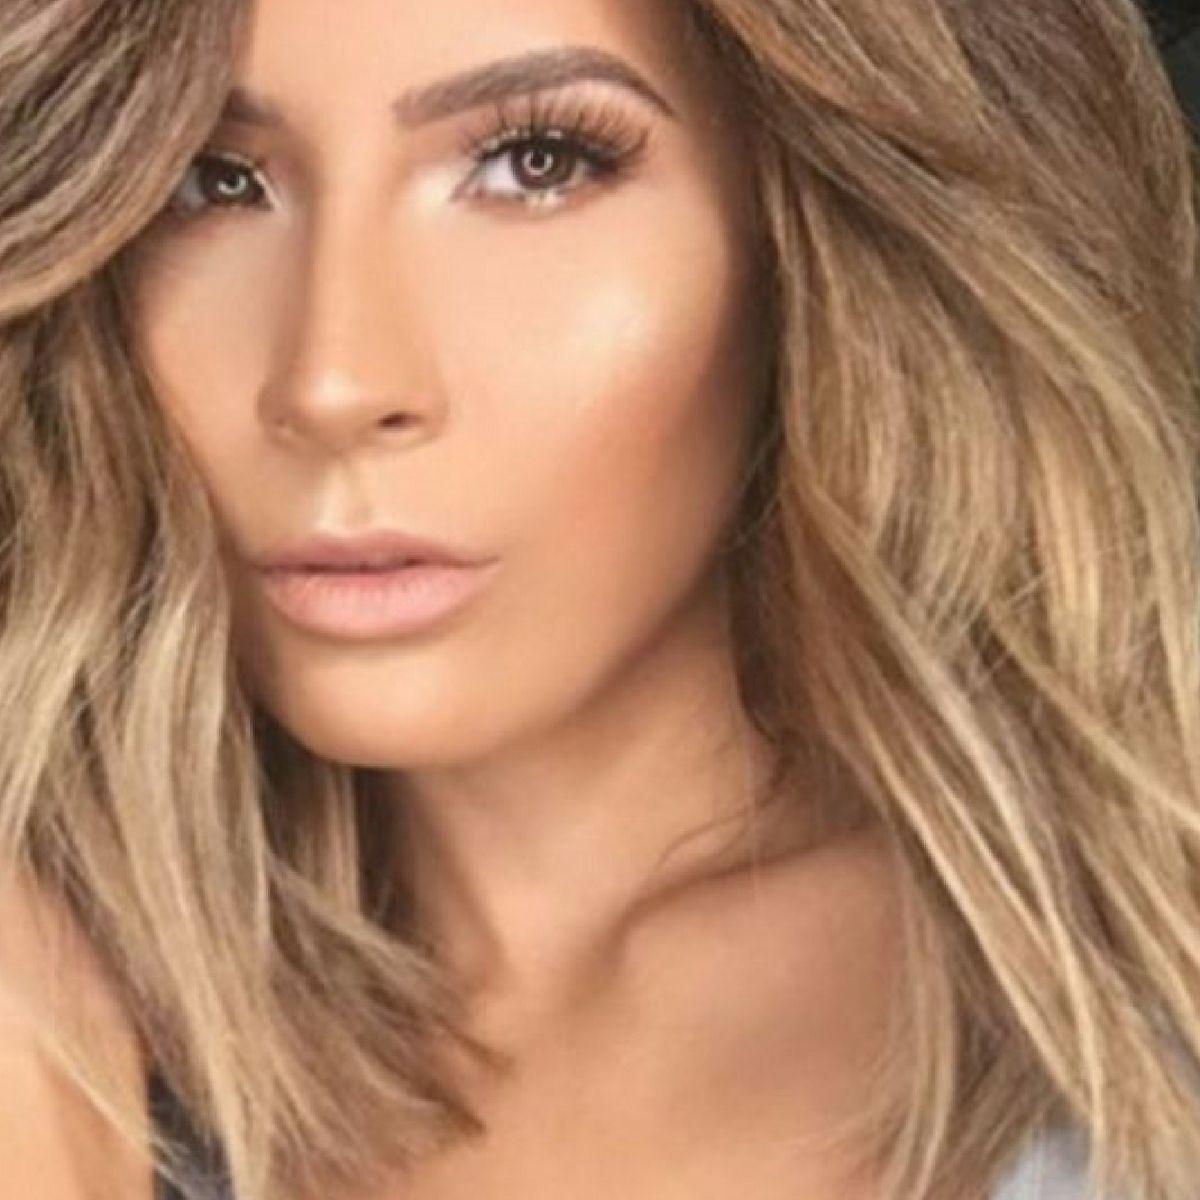 DESI PERKINS Desi perkins hair, Makeup tips for brown